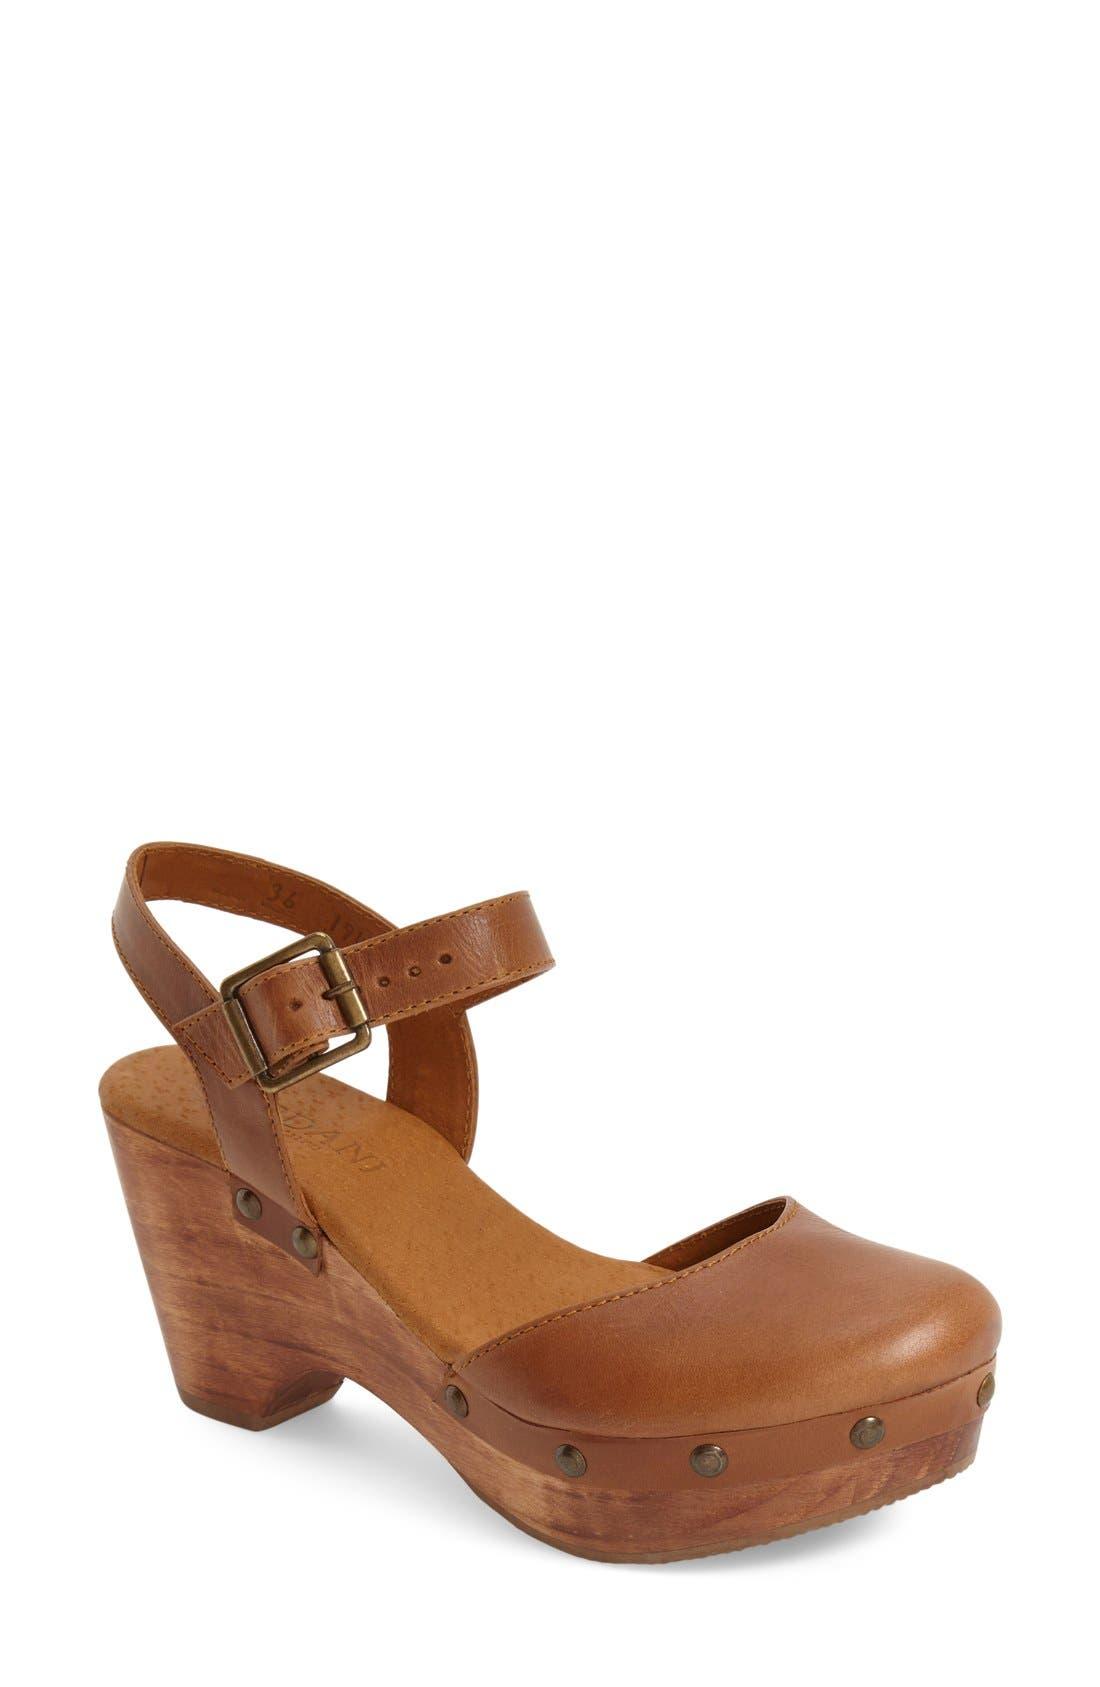 Alternate Image 1 Selected - Cordani 'Zori' Sandal (Women)